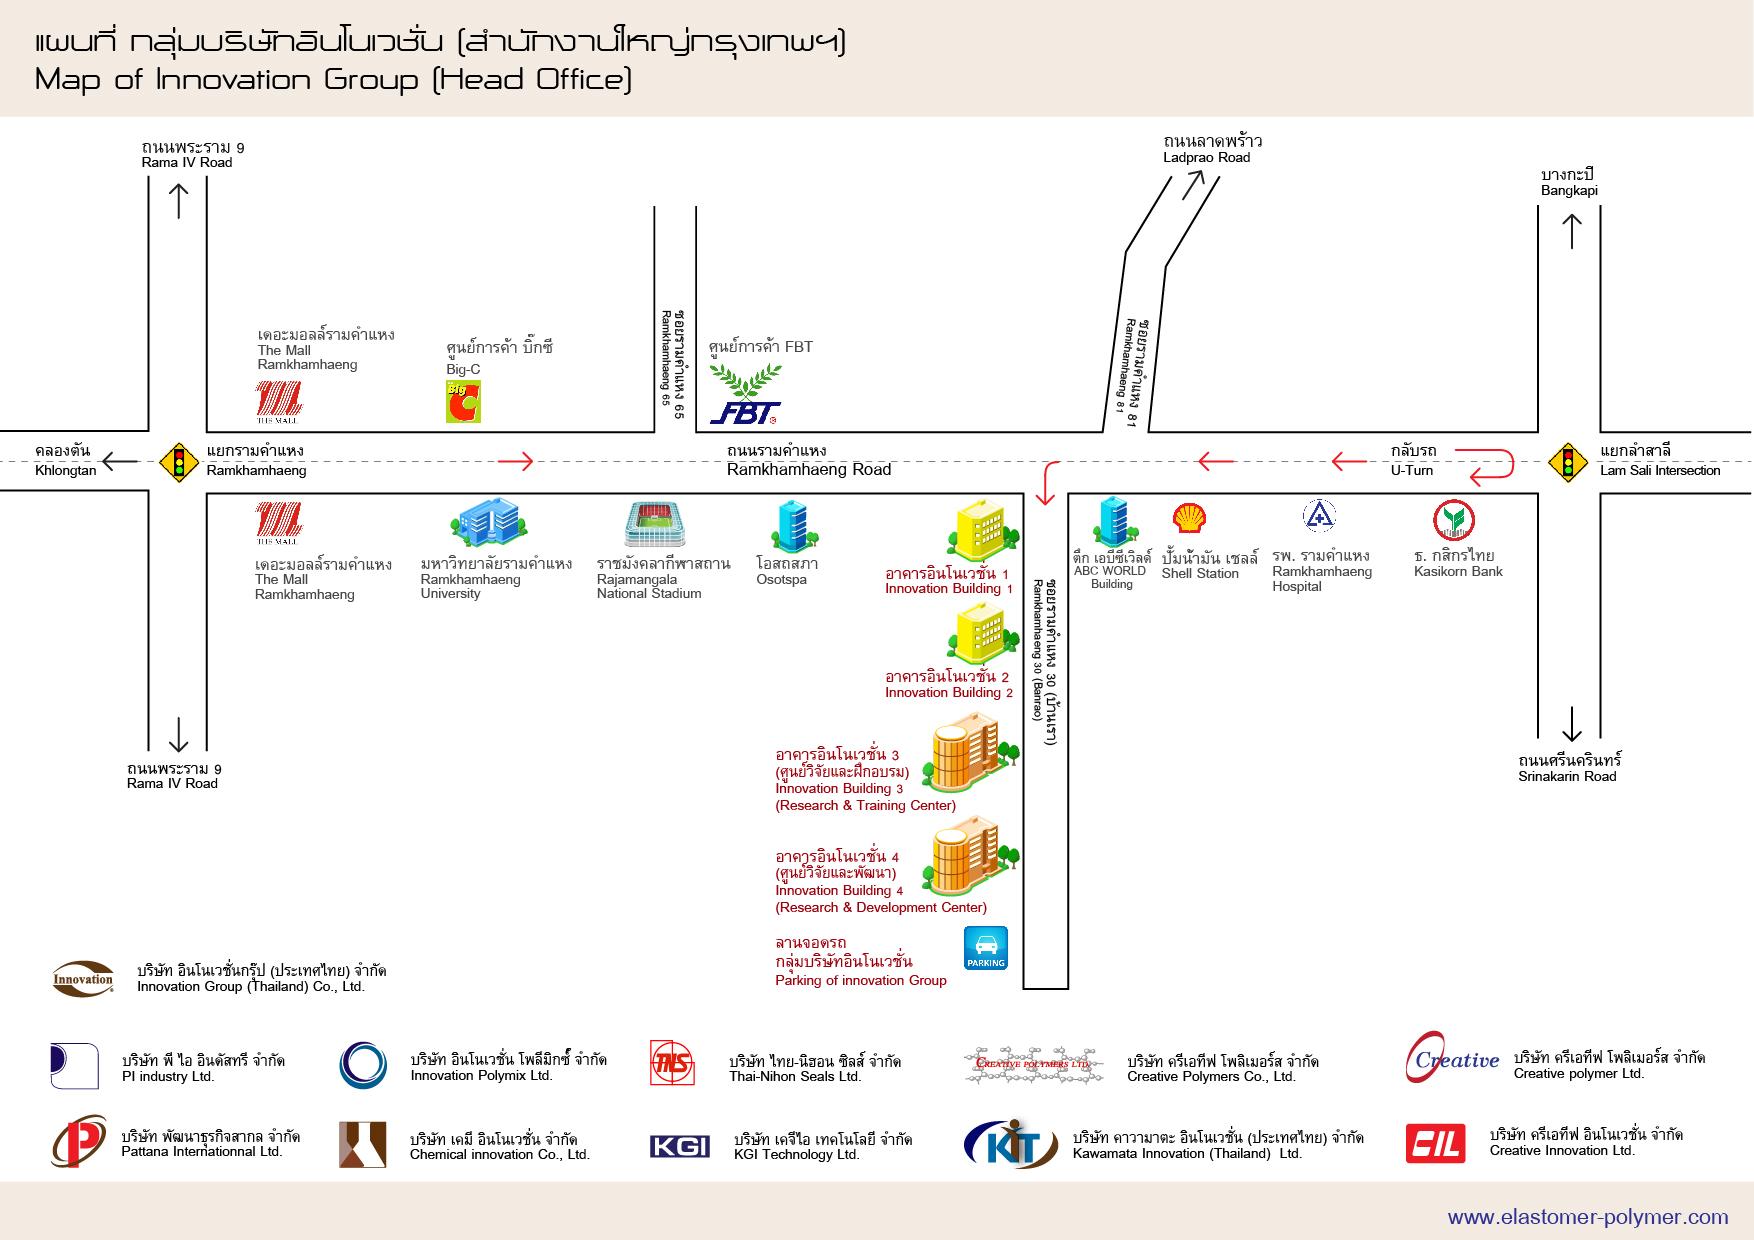 Rubber Compound - Innovation Group (Thailand) Ltd